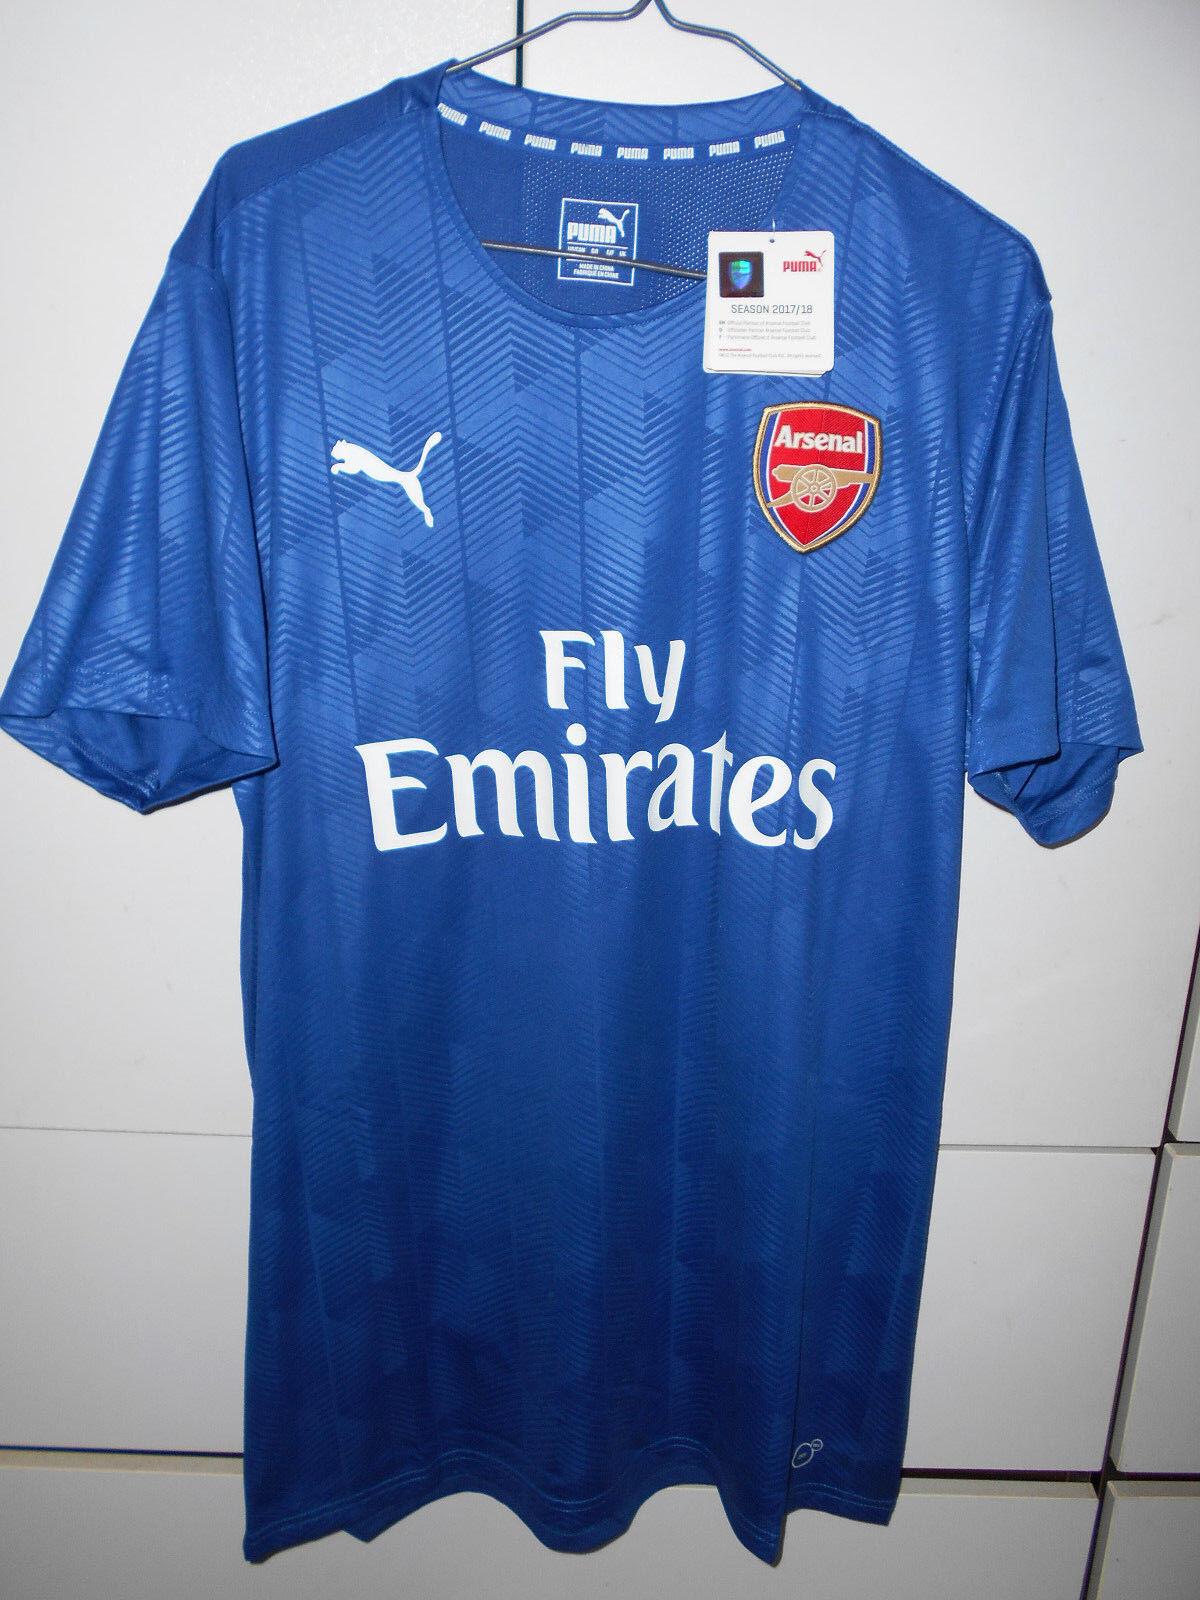 Puma Authentic Soccer Arsenal 2017-18 Jersey Shirt Fans Training bluee M L XL